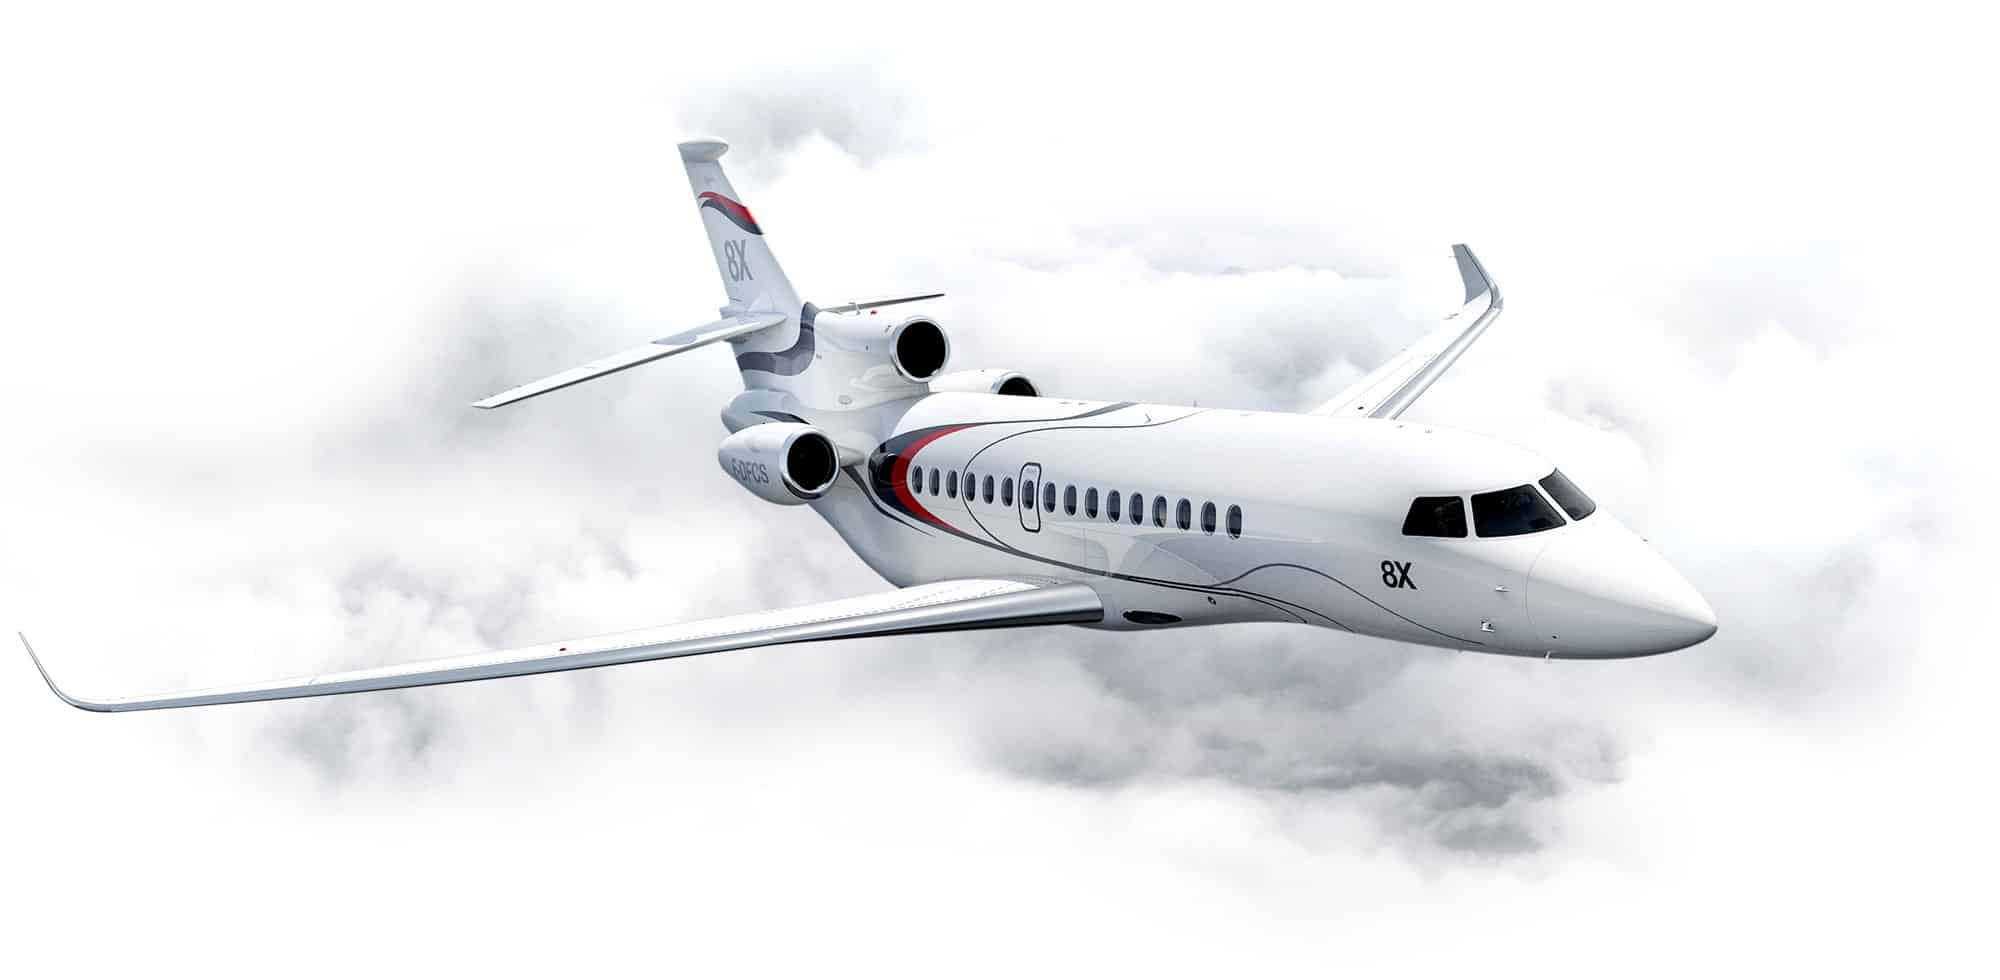 dassault-falcon-8x-business-jet